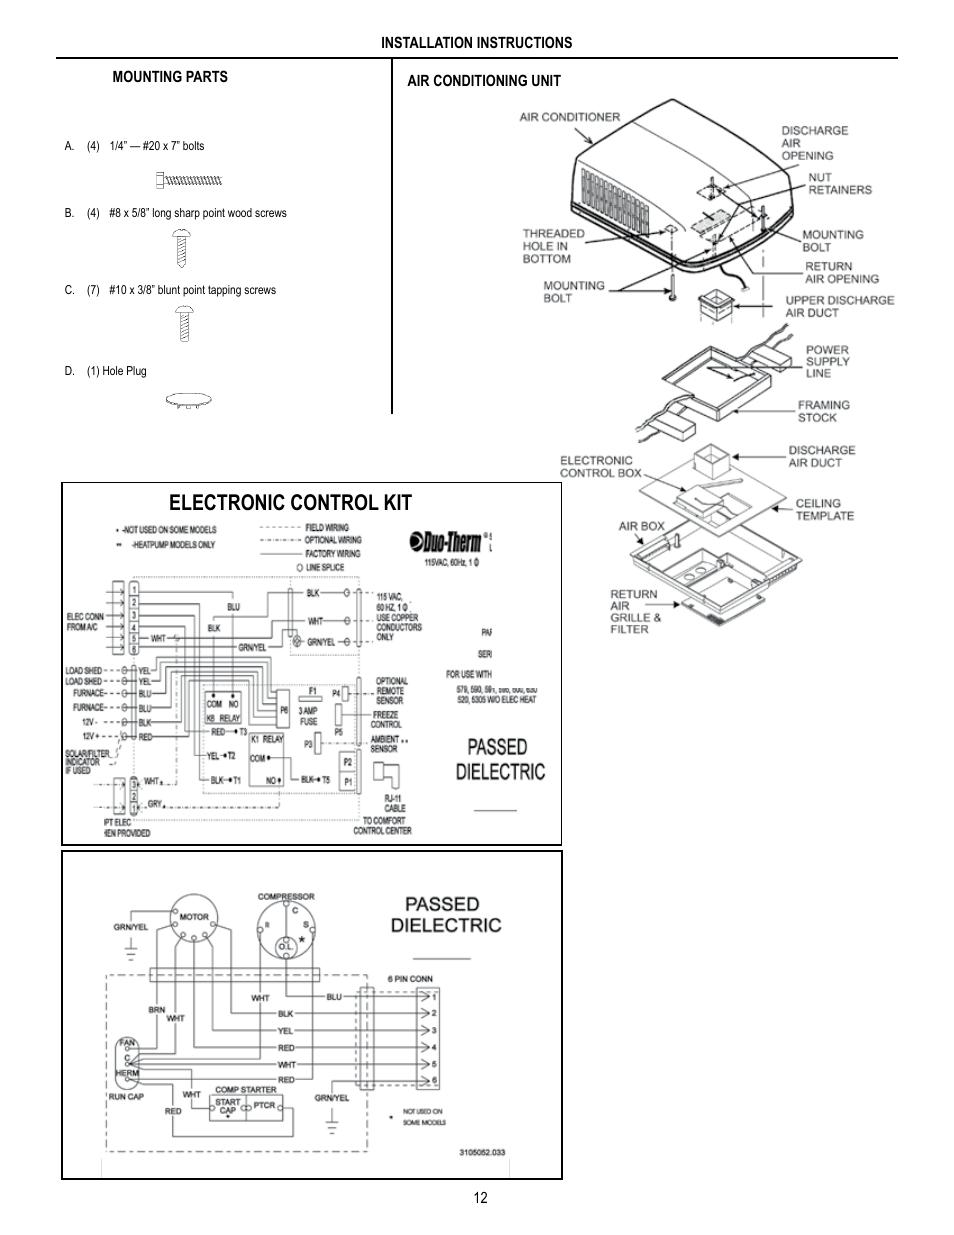 medium resolution of electronic control kit unit field wiring diagram dometic brisk air rv thermostat wiring diagram dometic brisk air wiring diagram